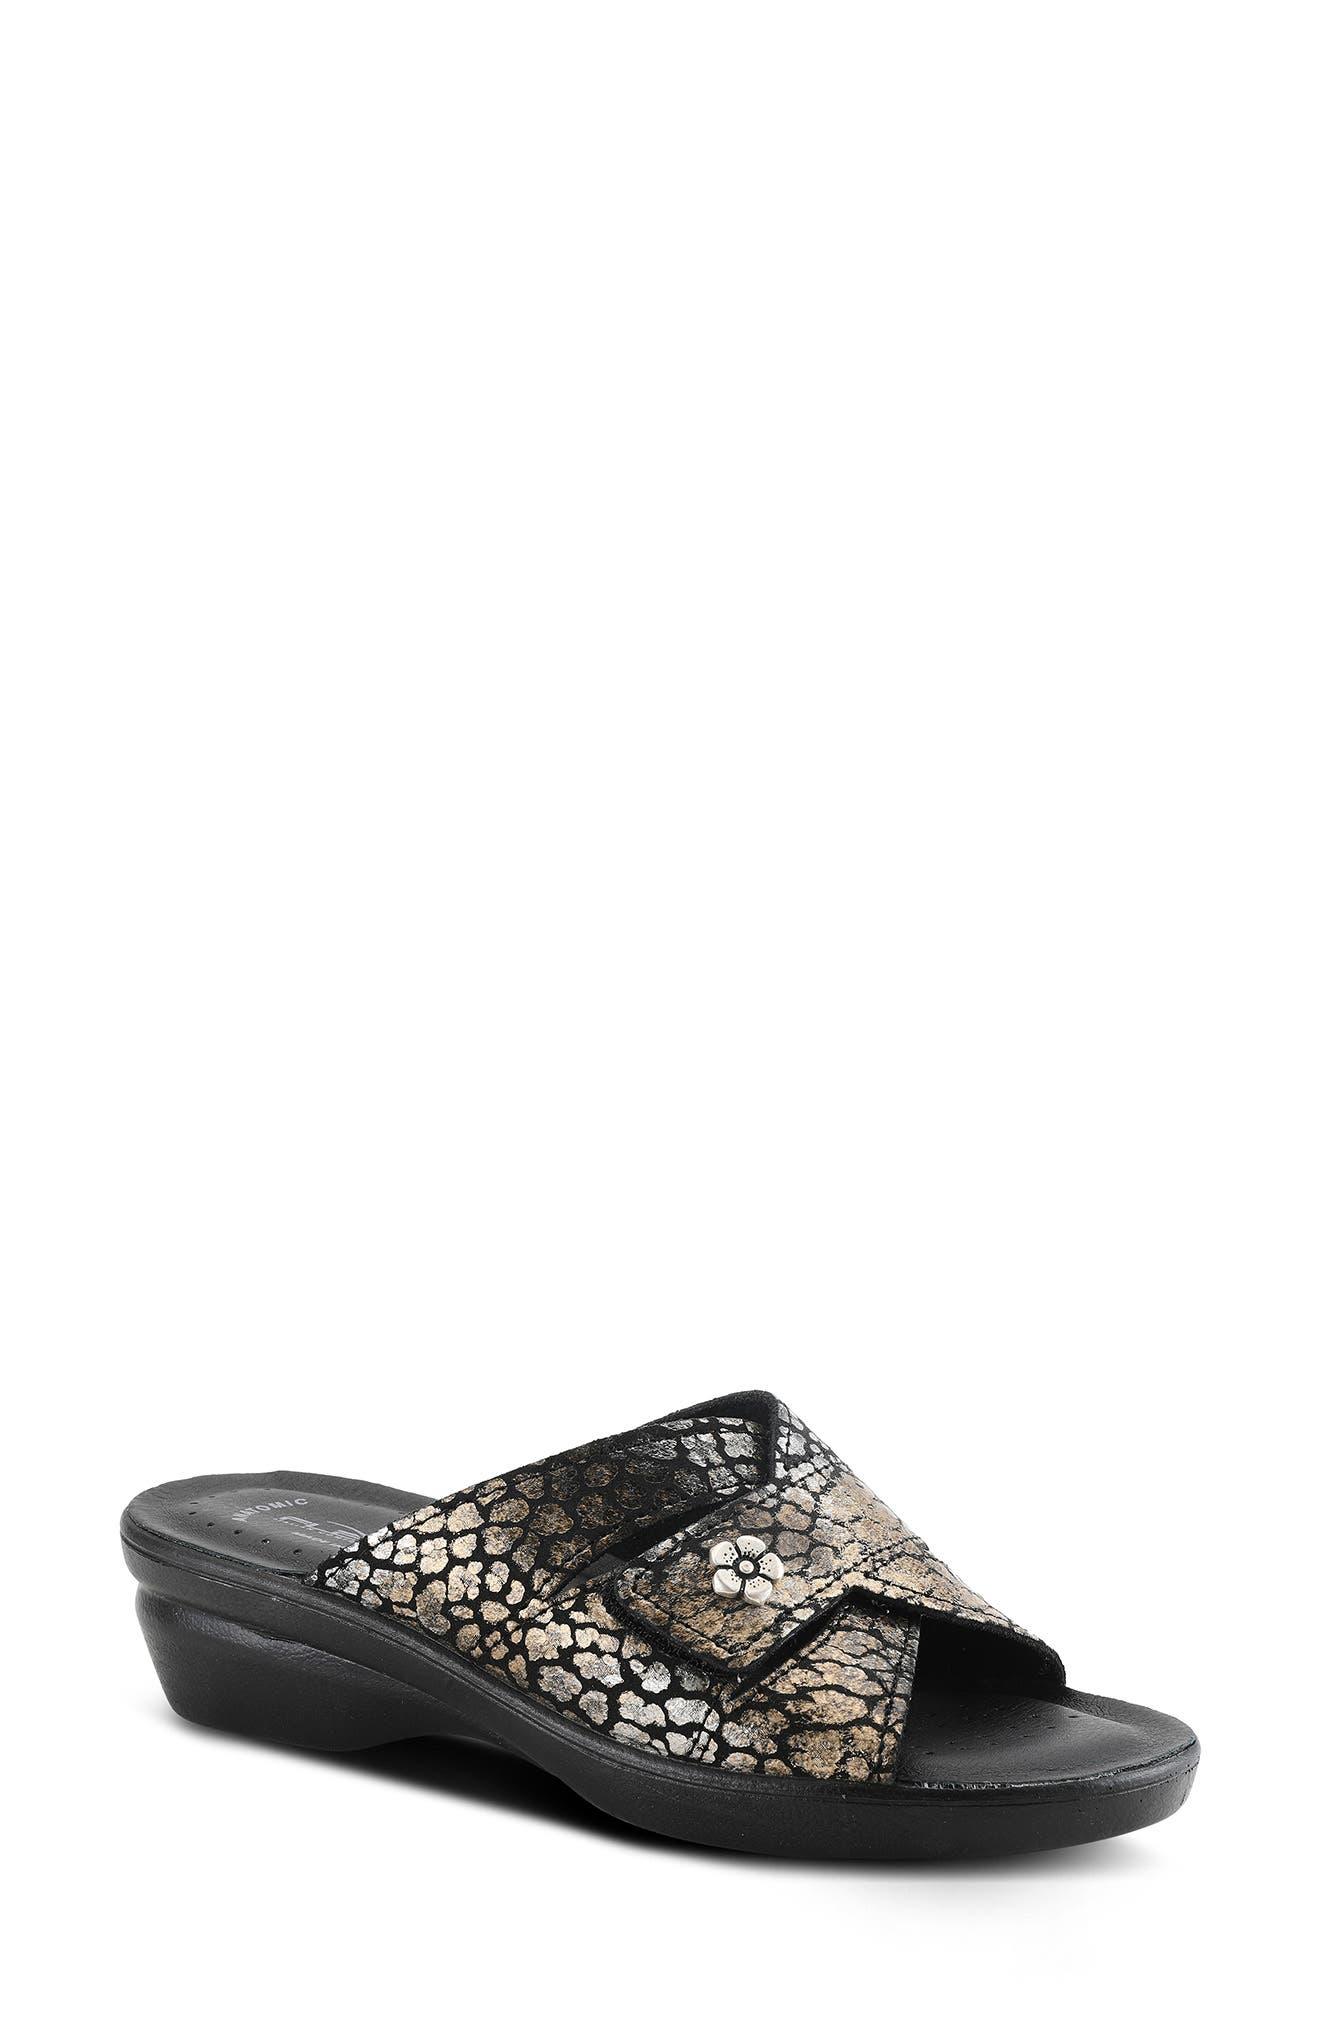 Fedame Slide Sandal